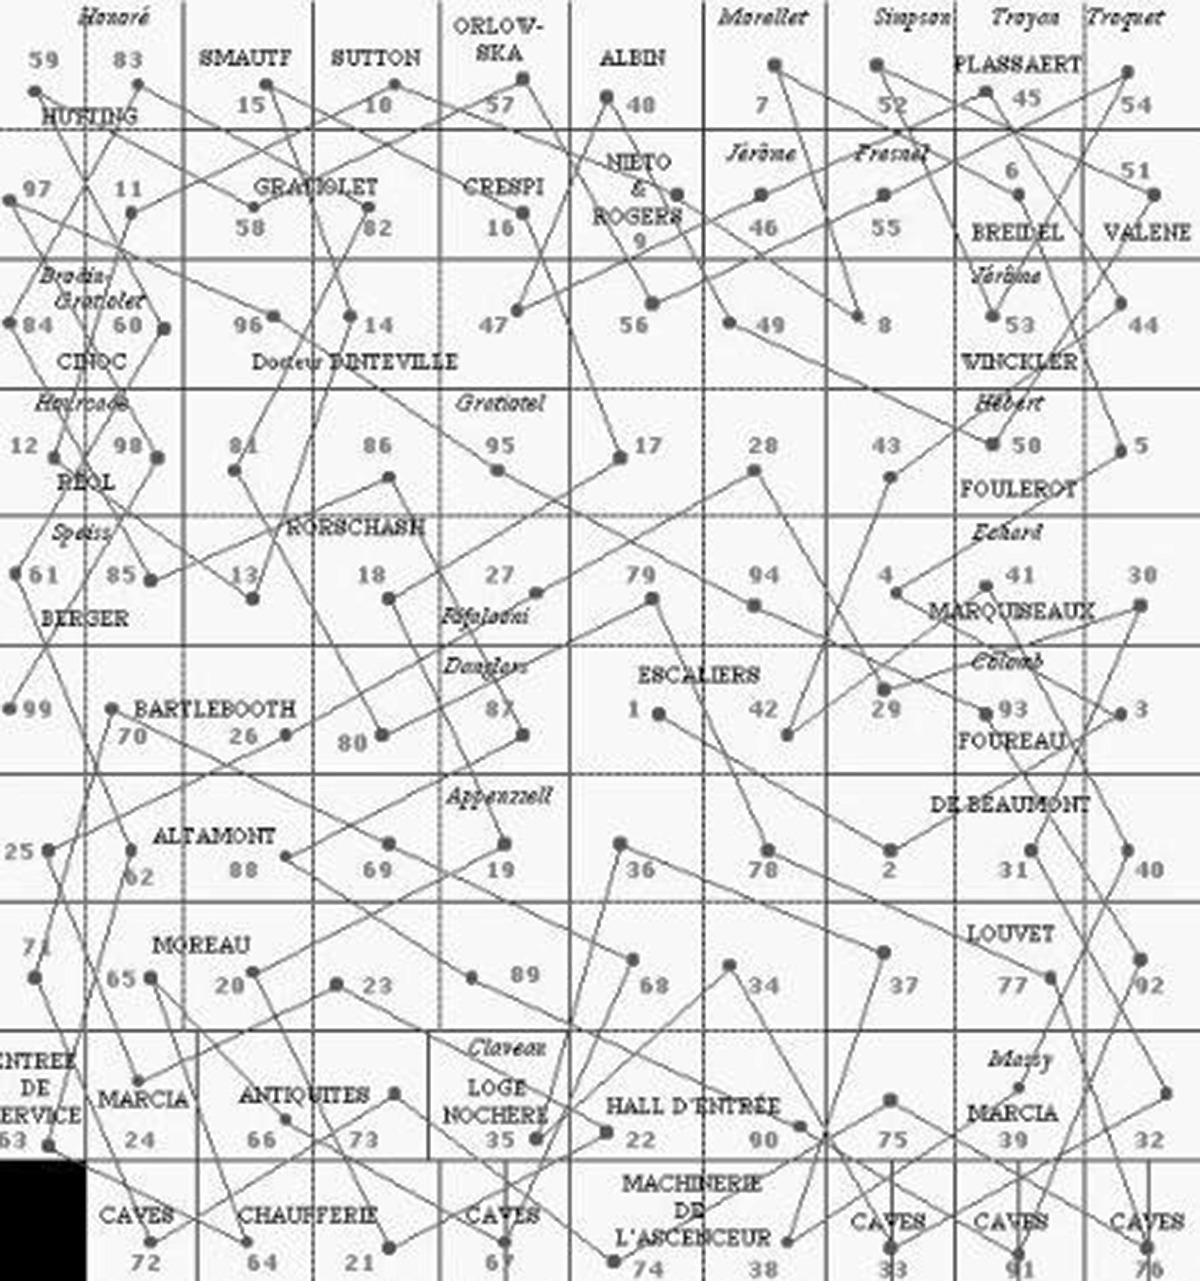 MADHAS studio — Georges Perec, diagram of chess moves he